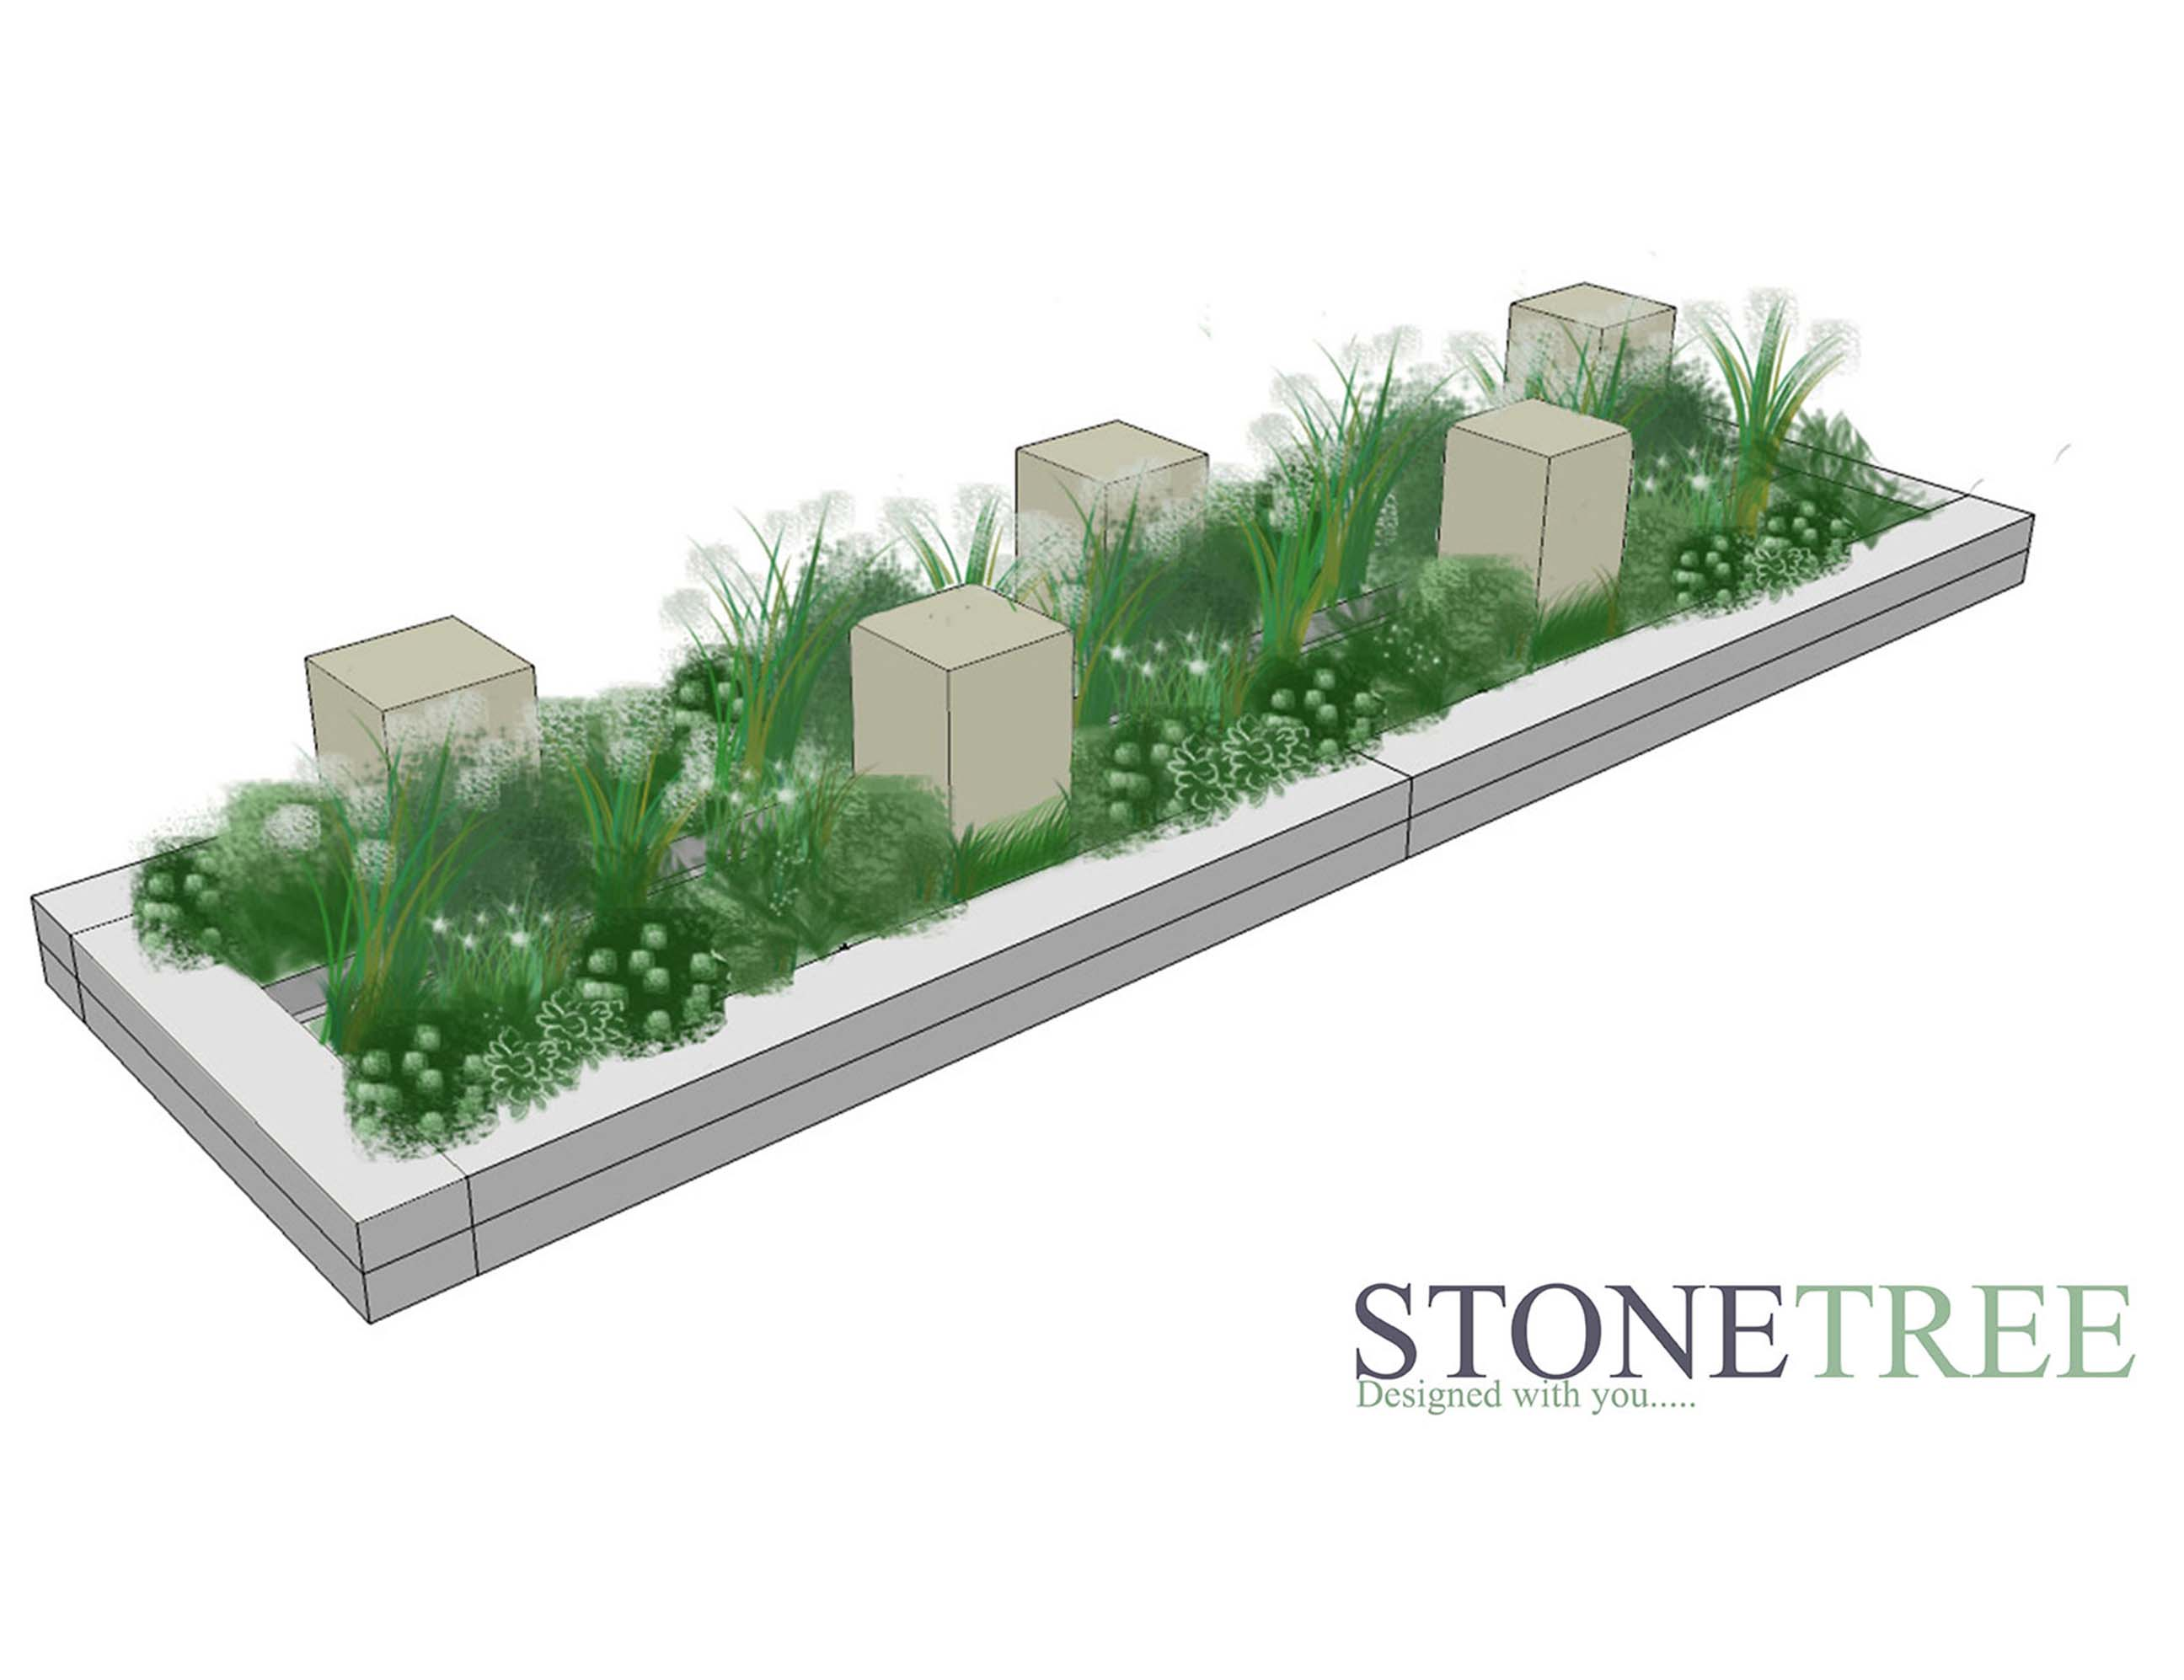 gardeners world live stonetree